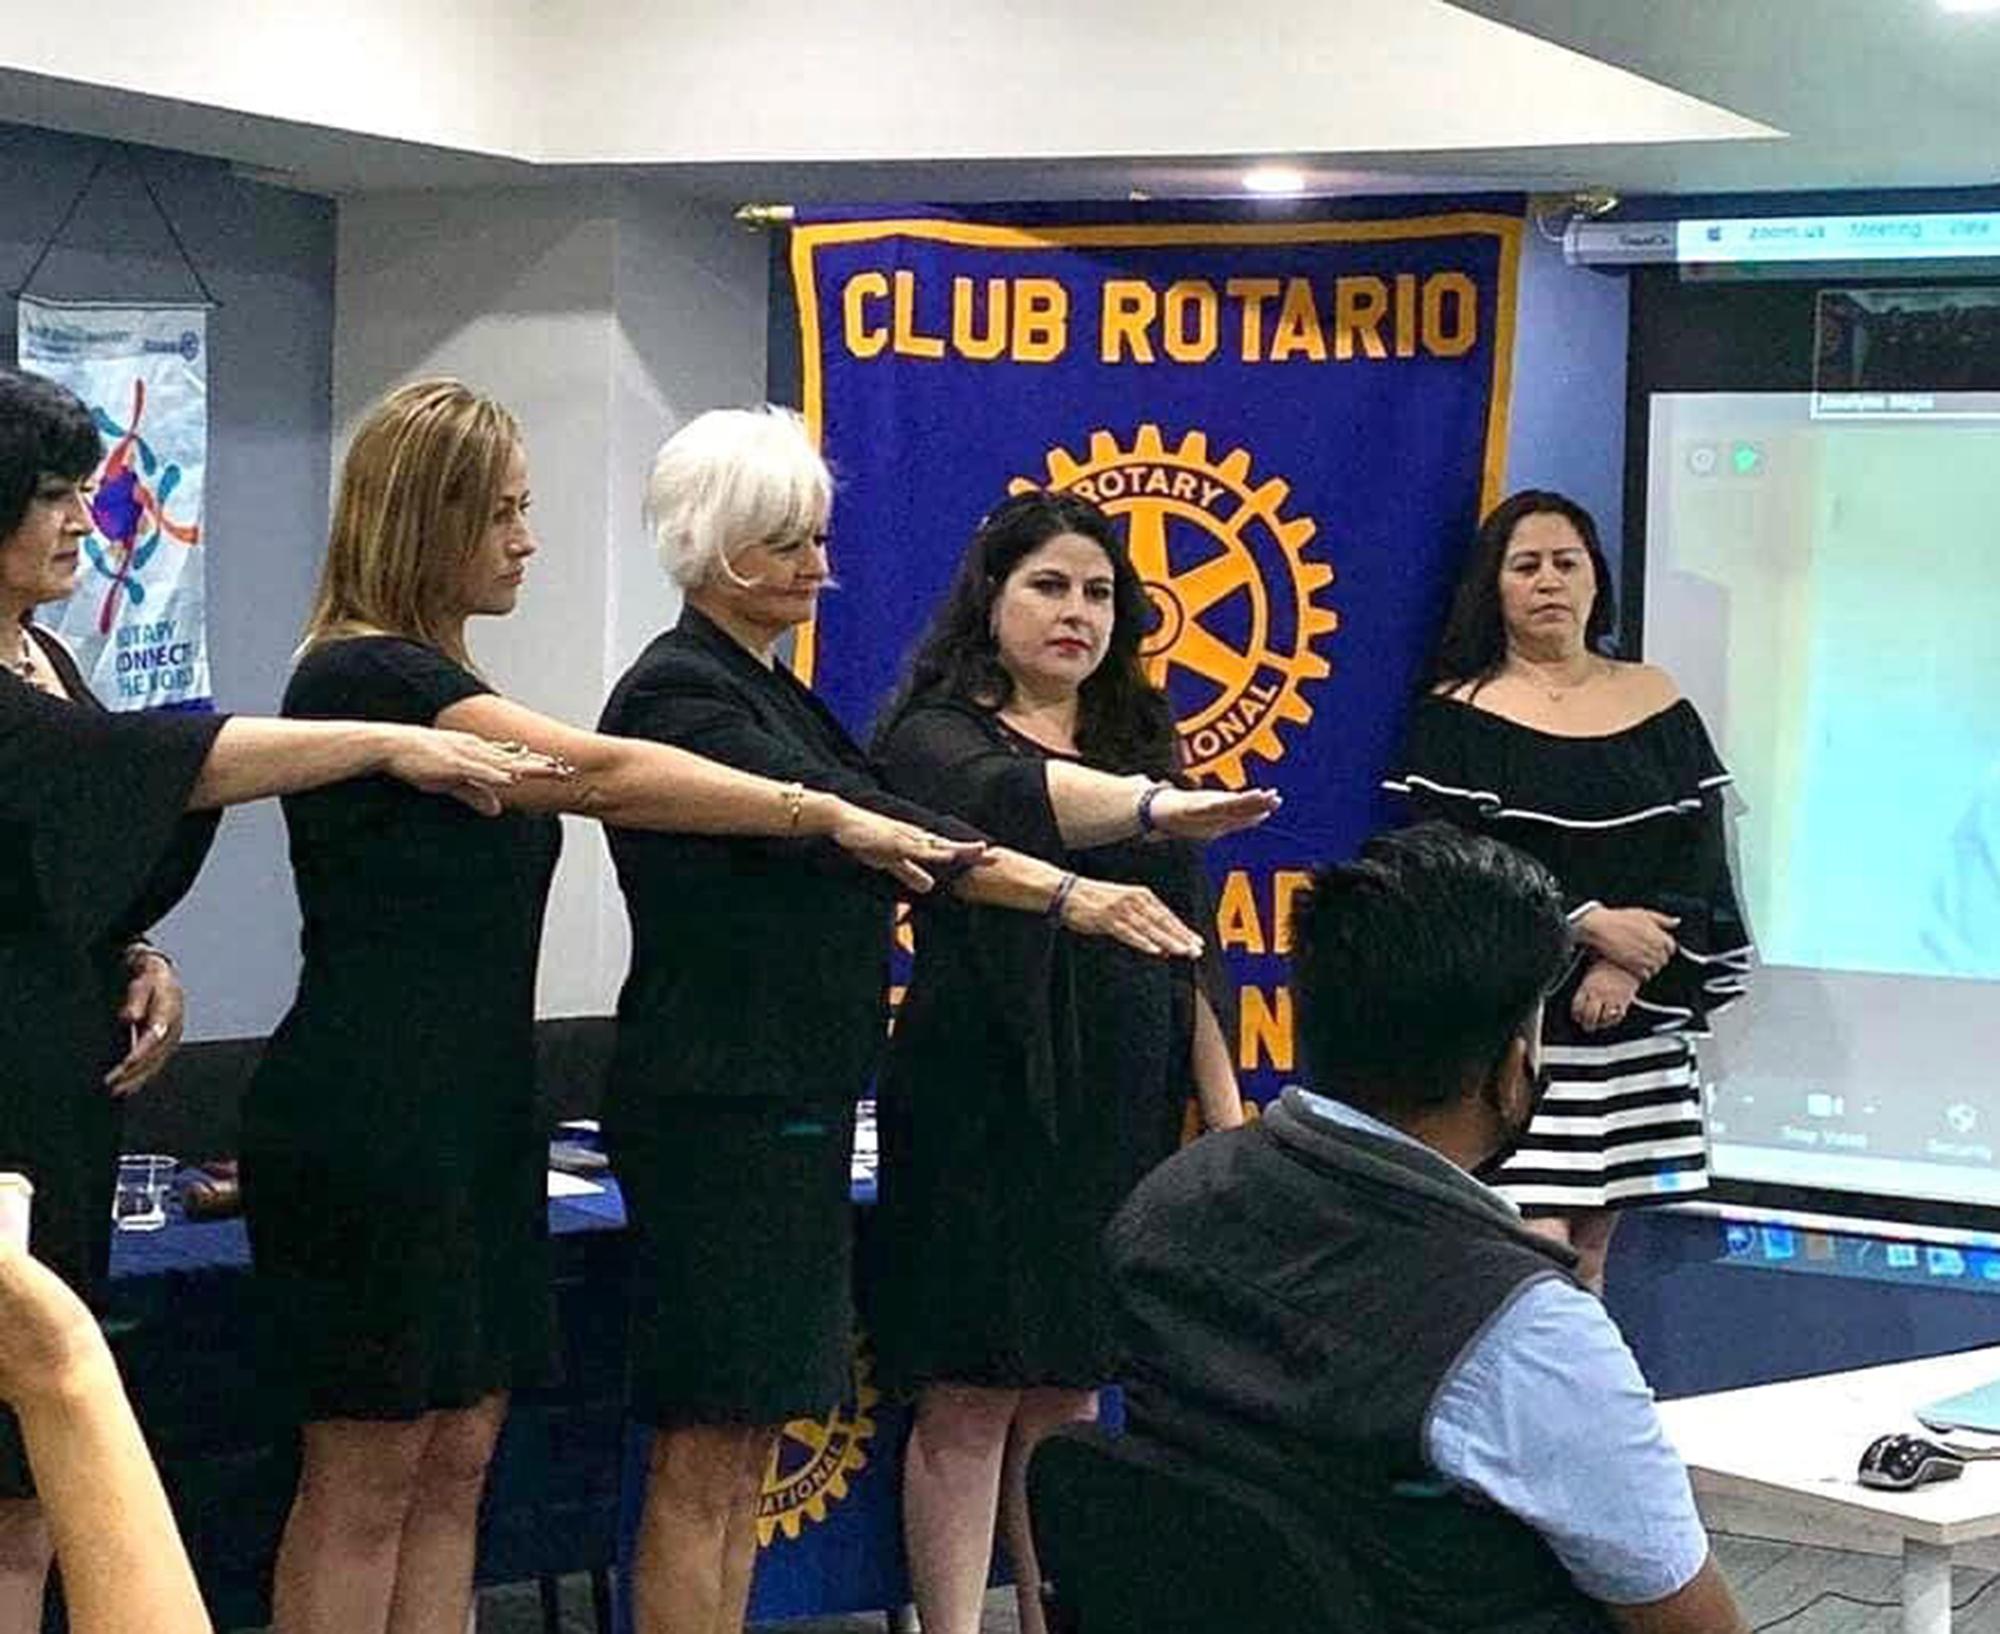 club rotario, presidenta, mesa directiva